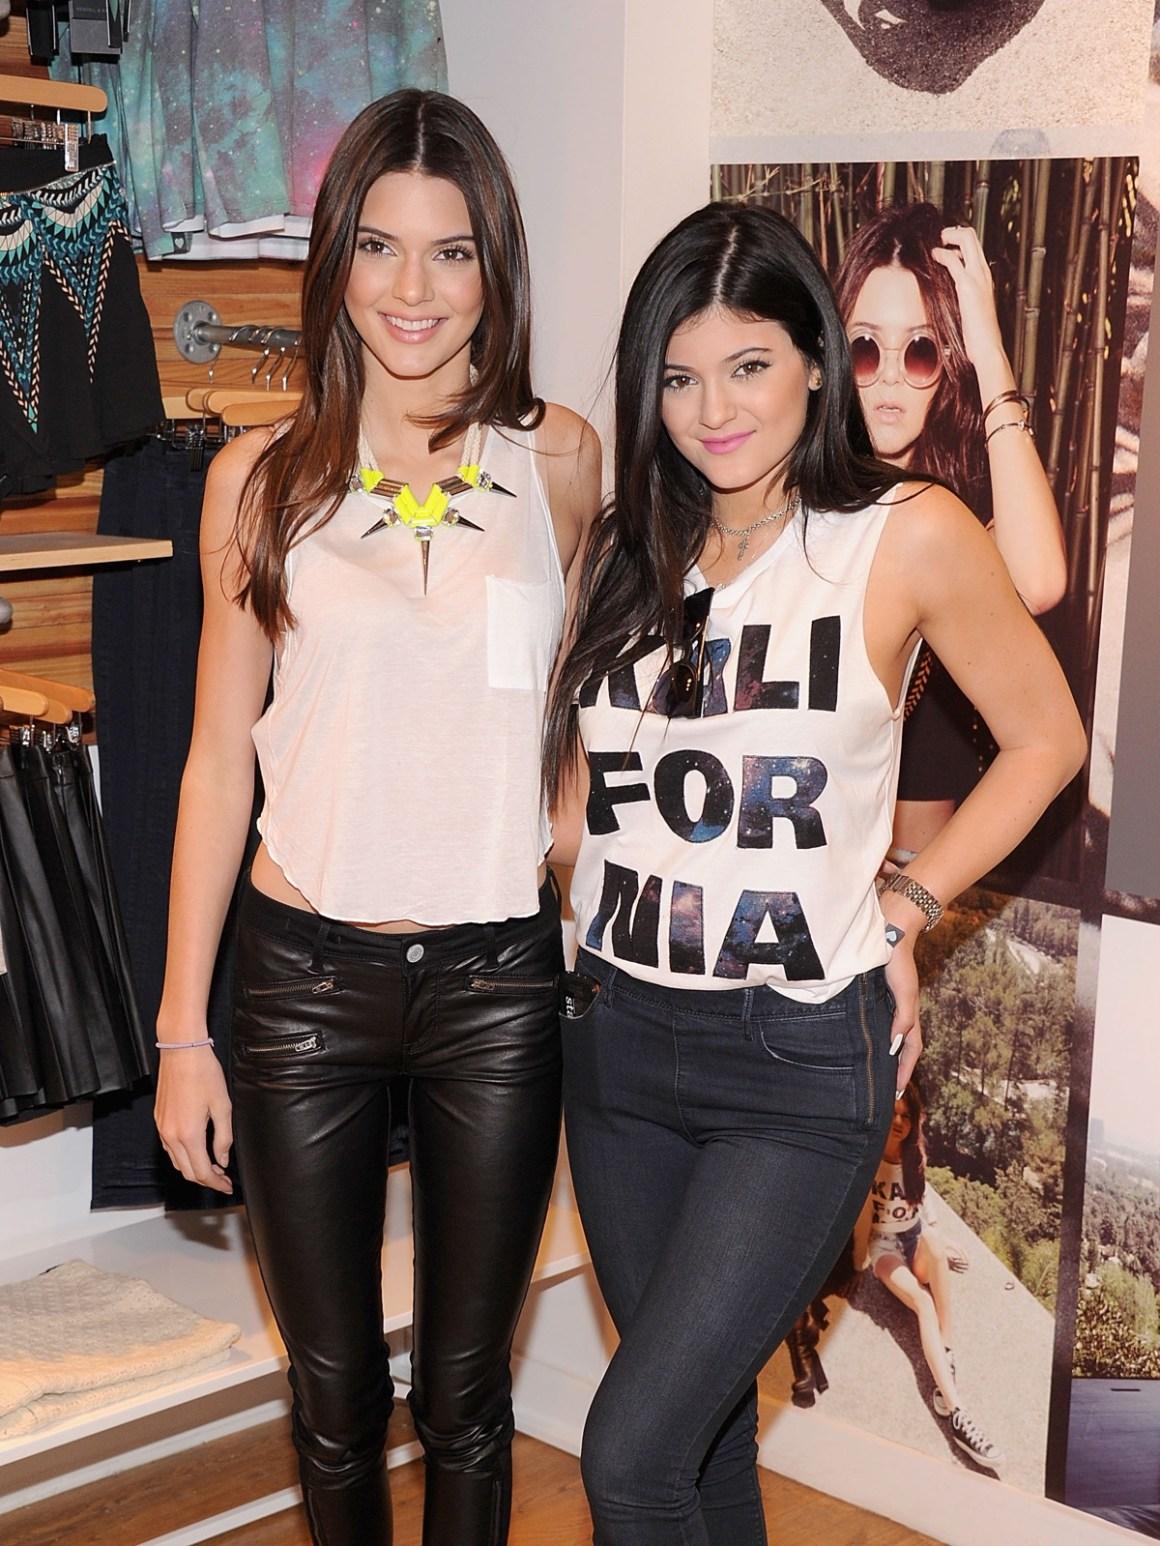 Kendall Jenner naked intruder arrested for stalking Kylie just hours after being released from jail 3